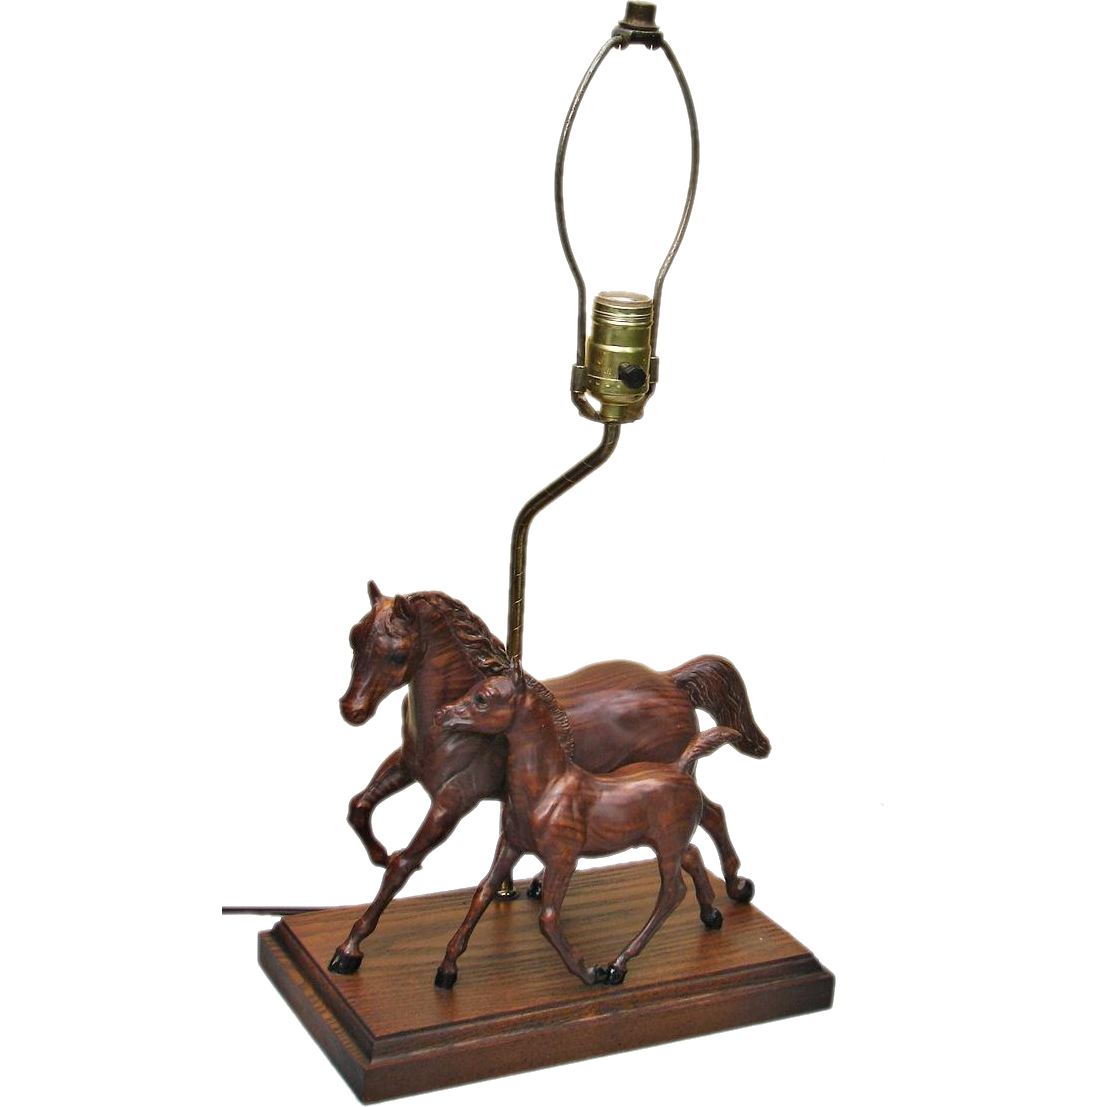 Breyer Horse Woodgrain Mare & Colt Table Lamp Vintage 1960s